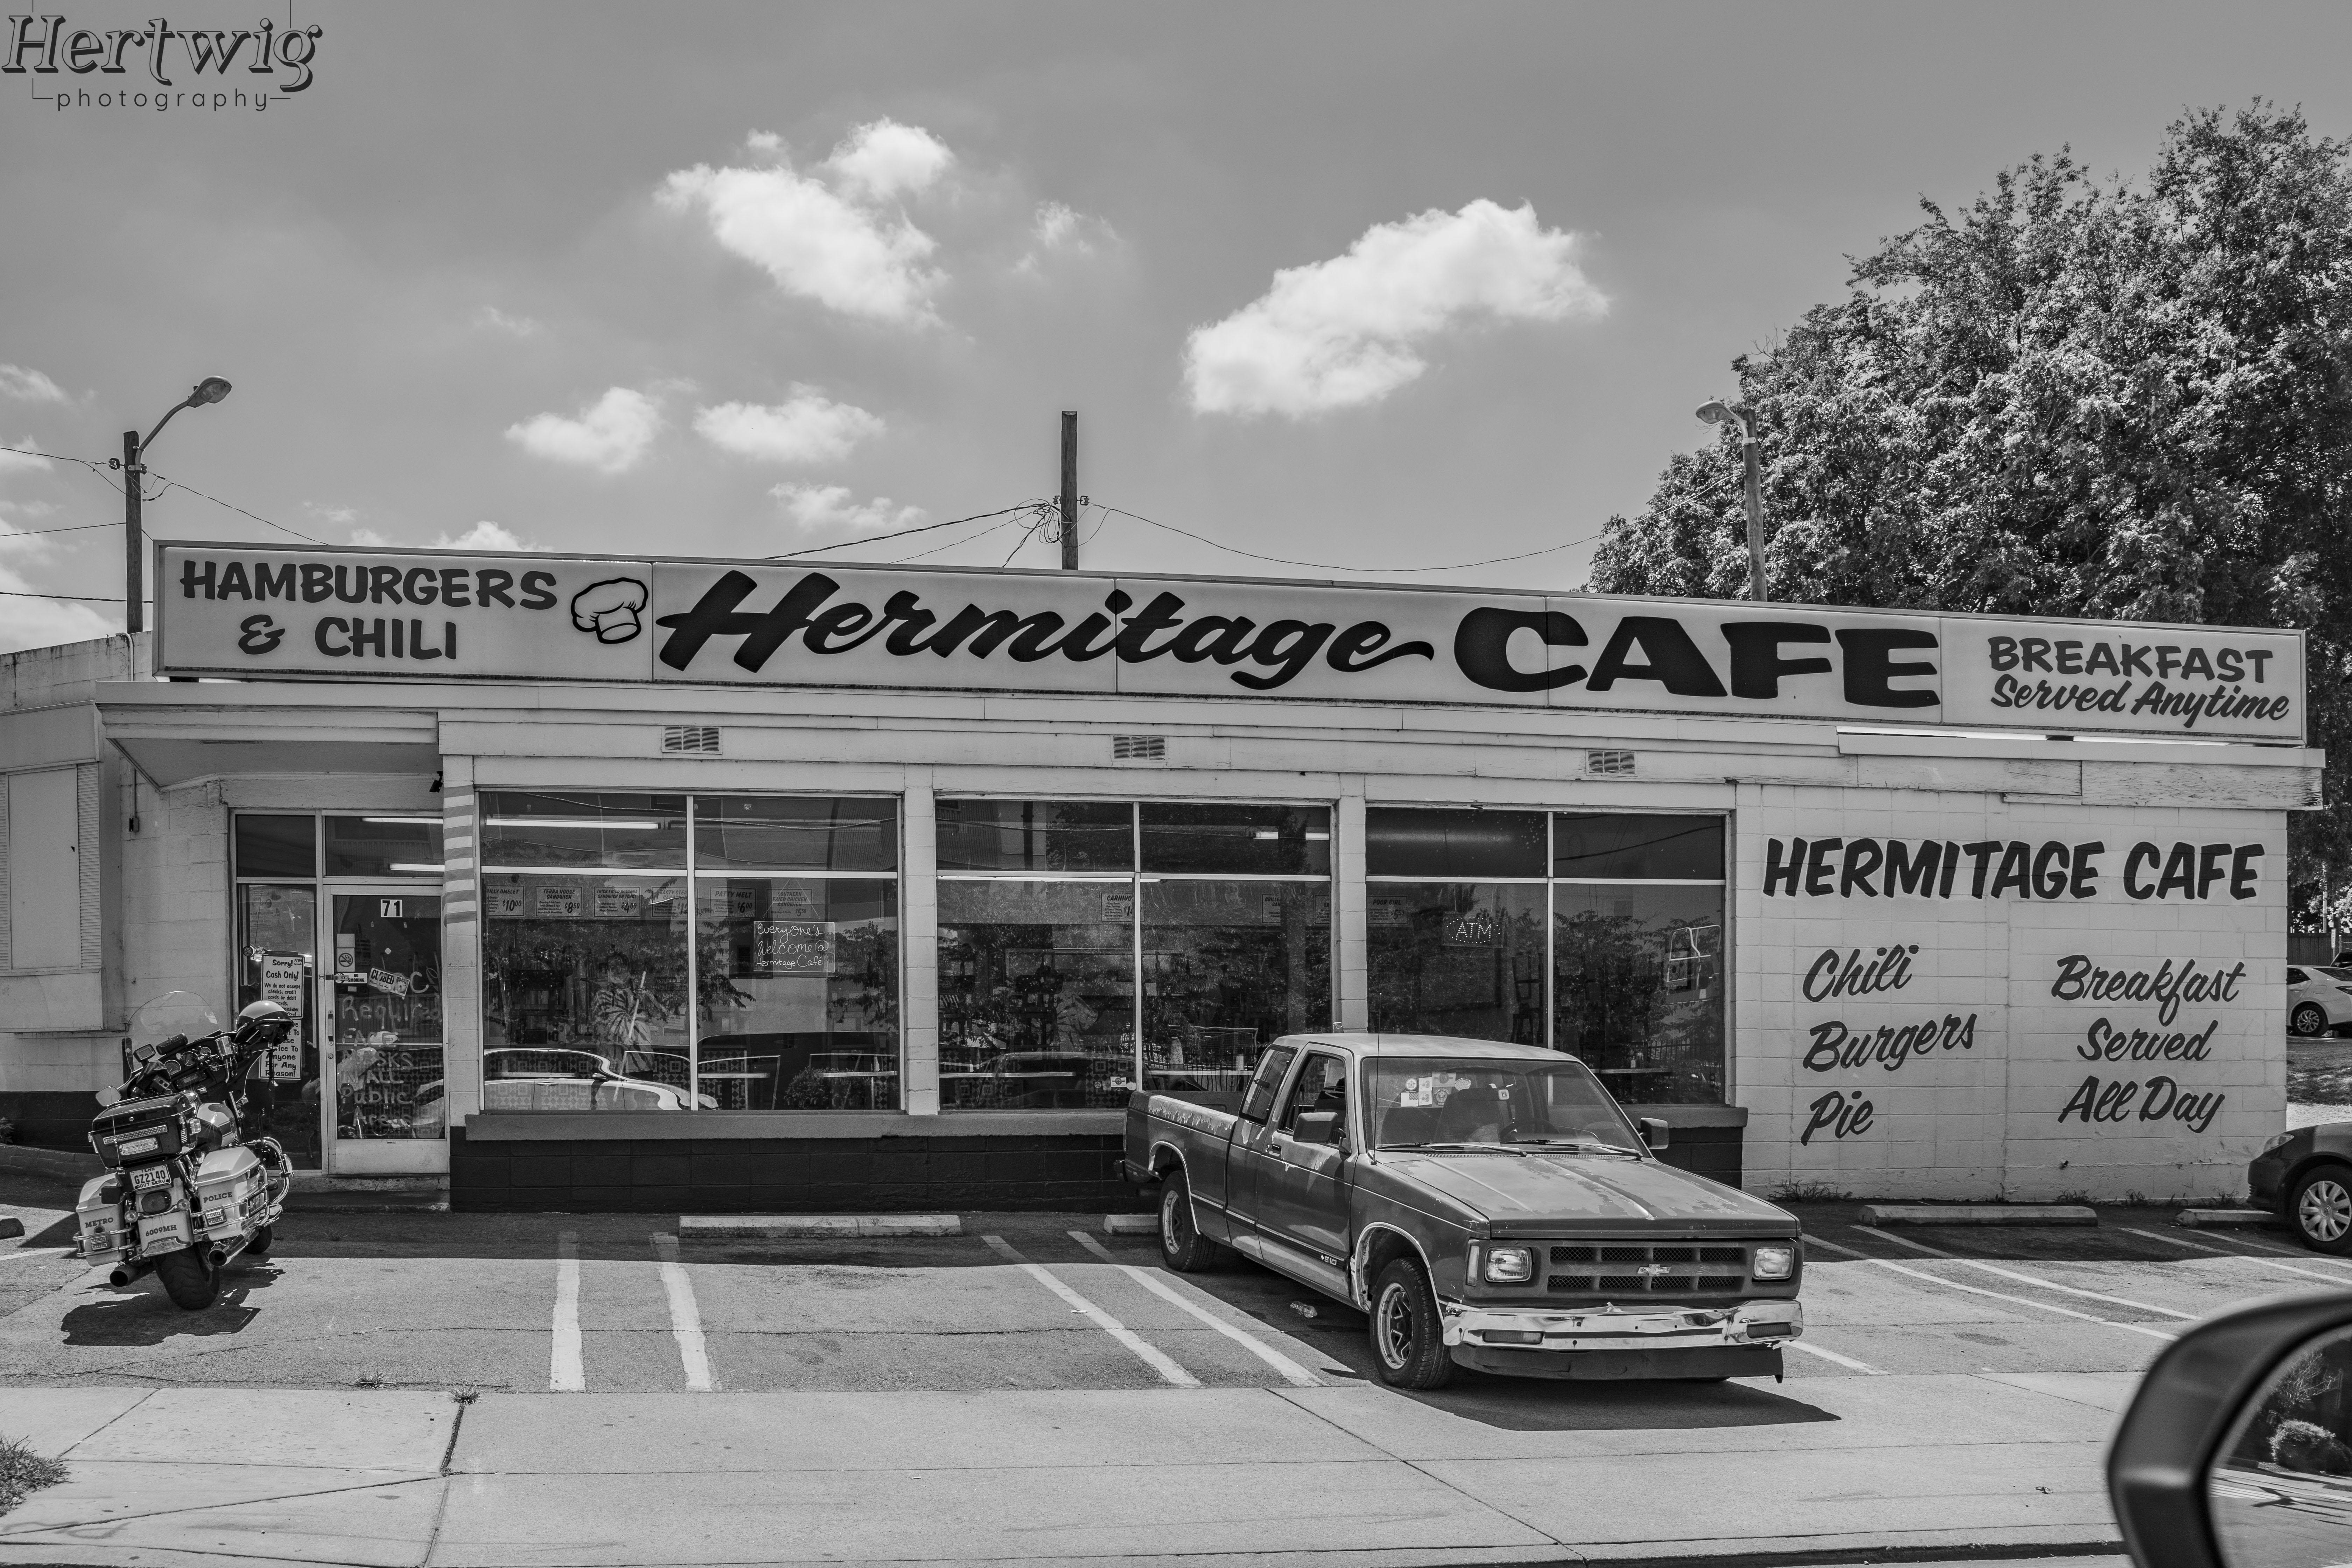 Hermitage Cafe - Nashville